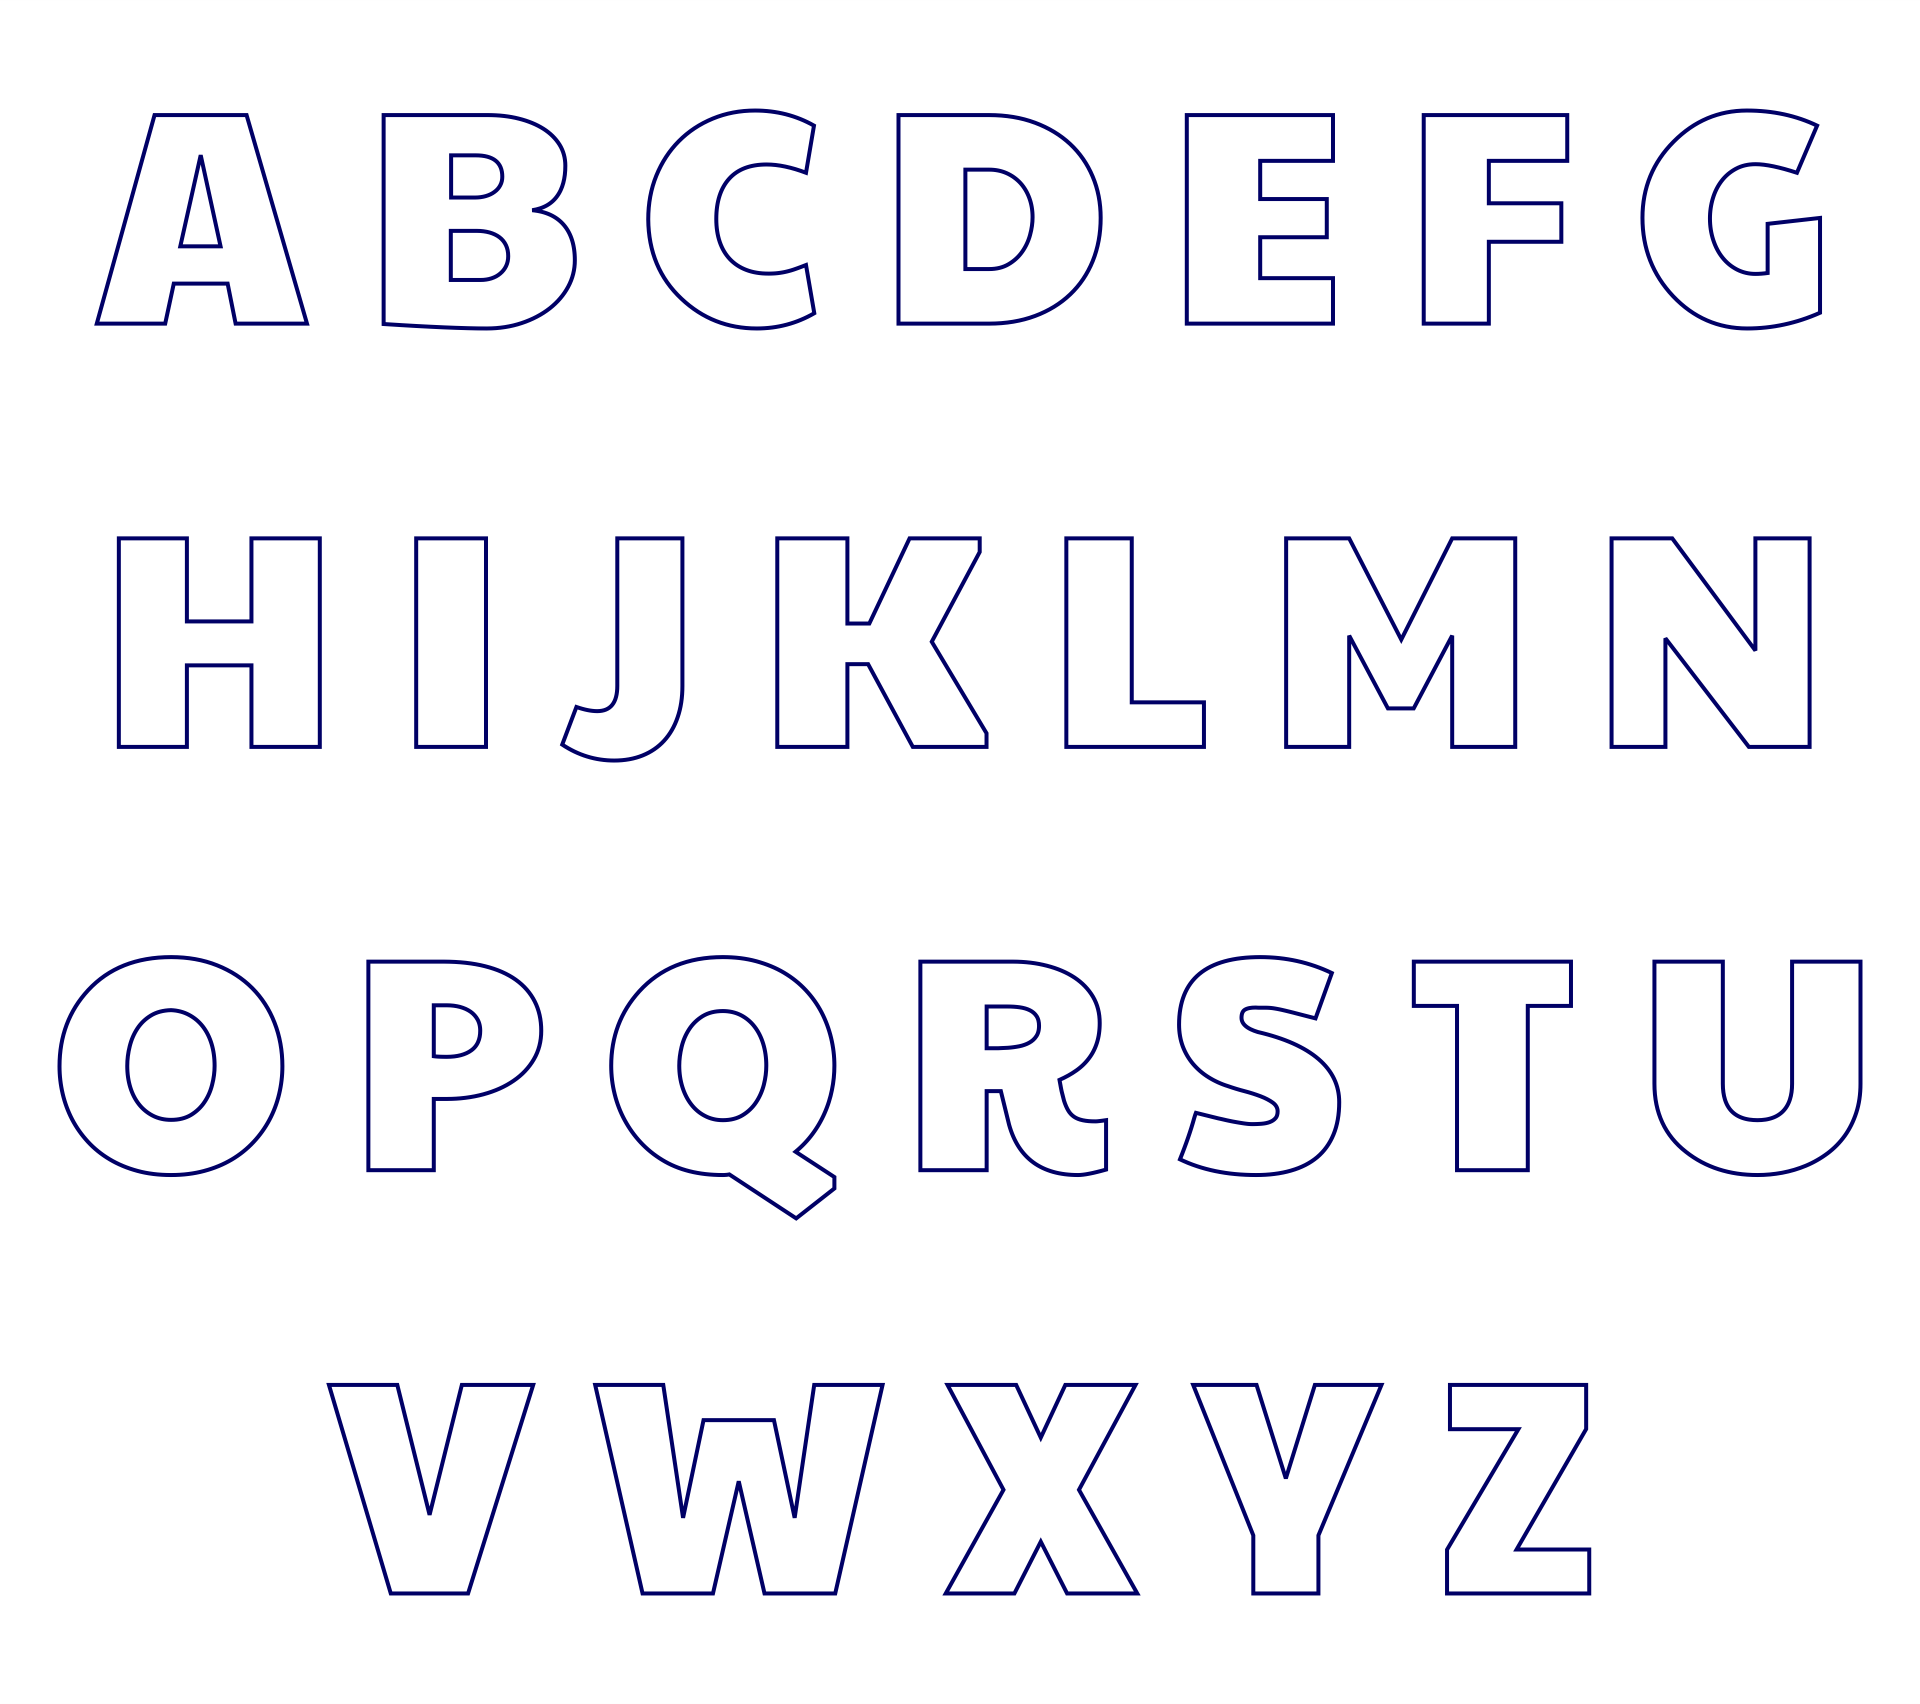 Free Alphabet Letter Templates To Print